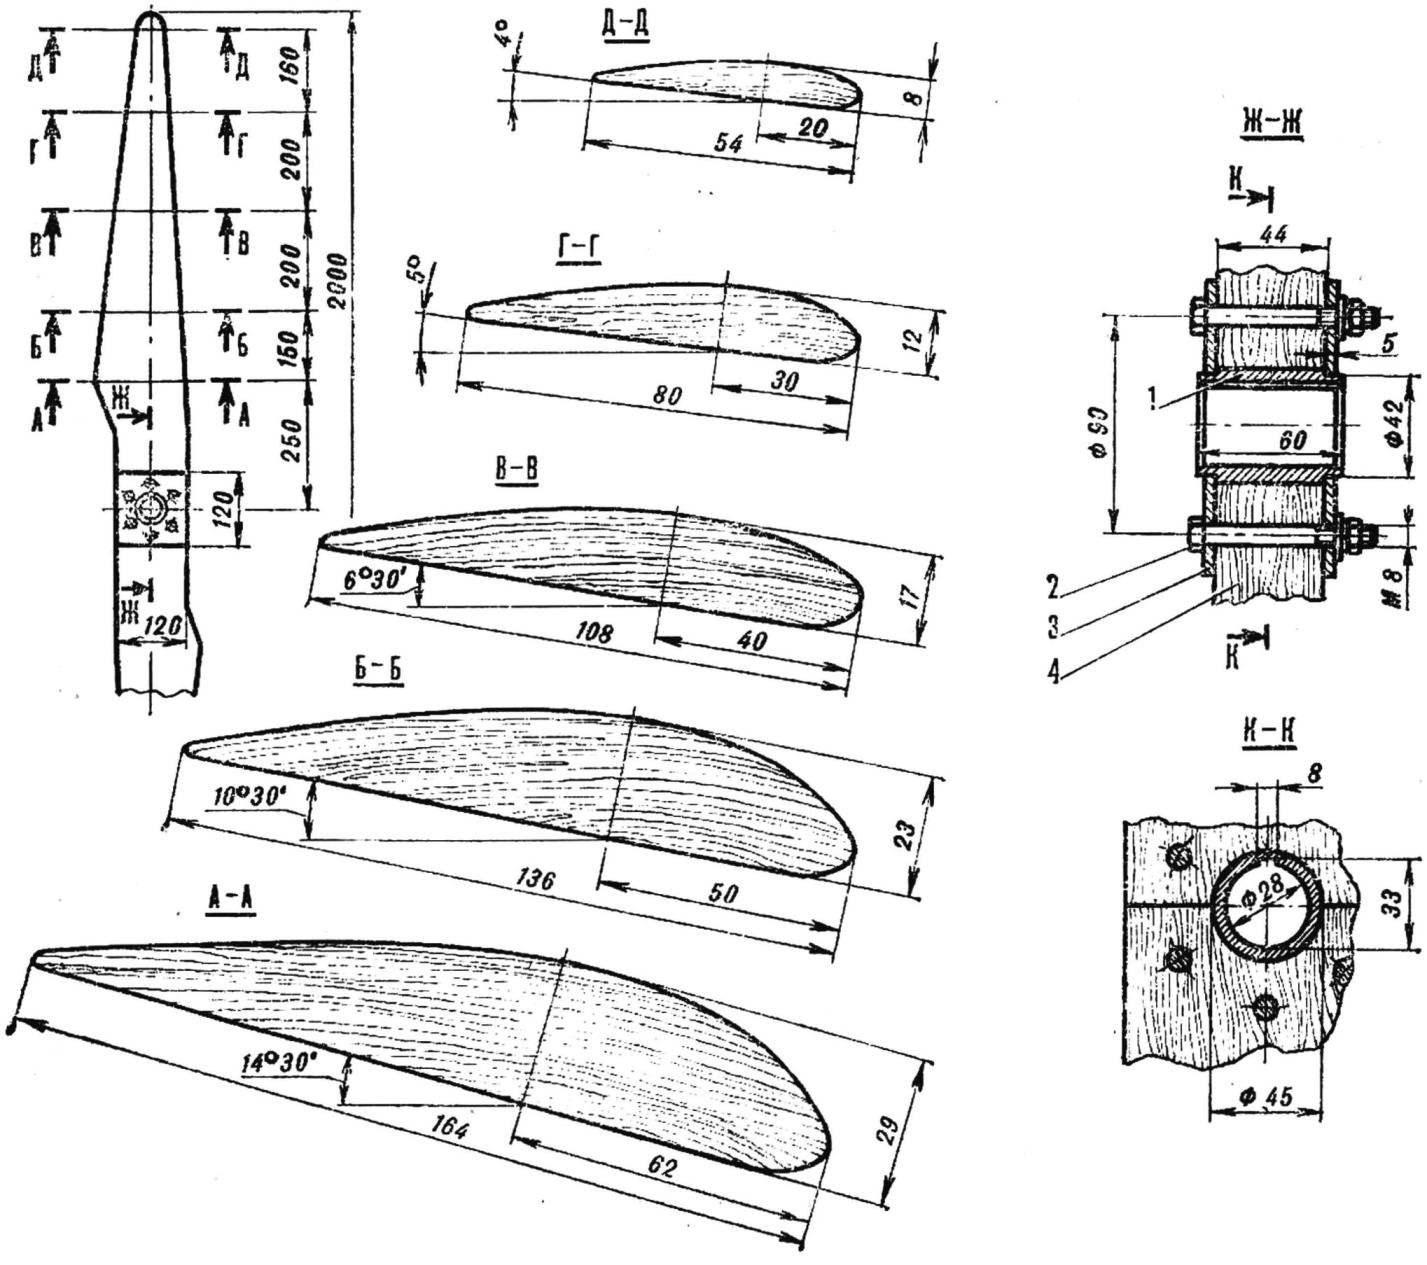 Fig. 3. Propeller